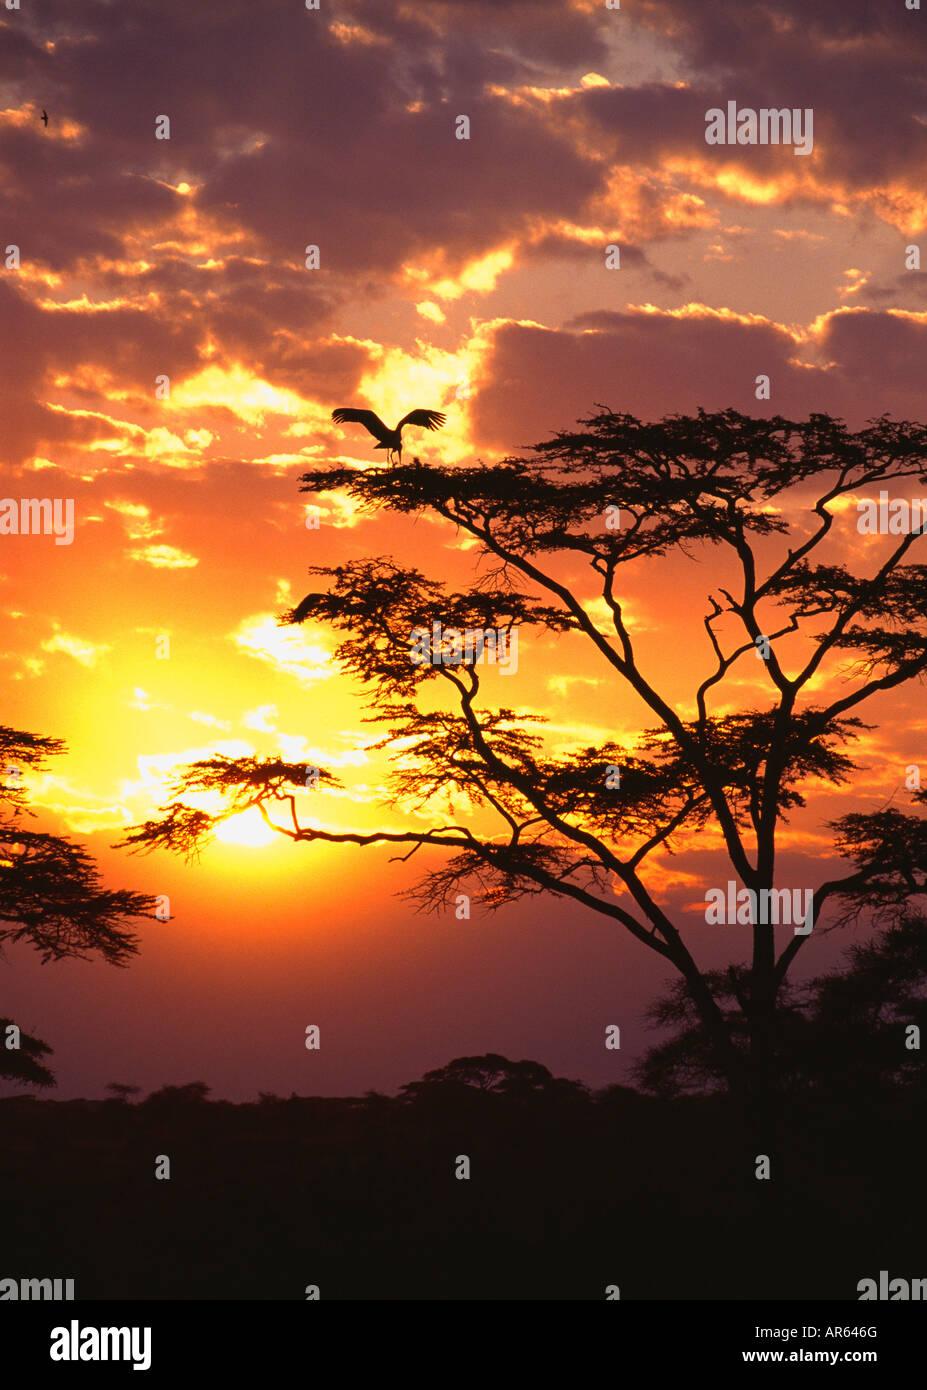 Maribou stork (Leptoptilos crumeniferus) in Acacia Tree at Sunset in the Serengeti National Park, Tanzania, Africa Stock Photo